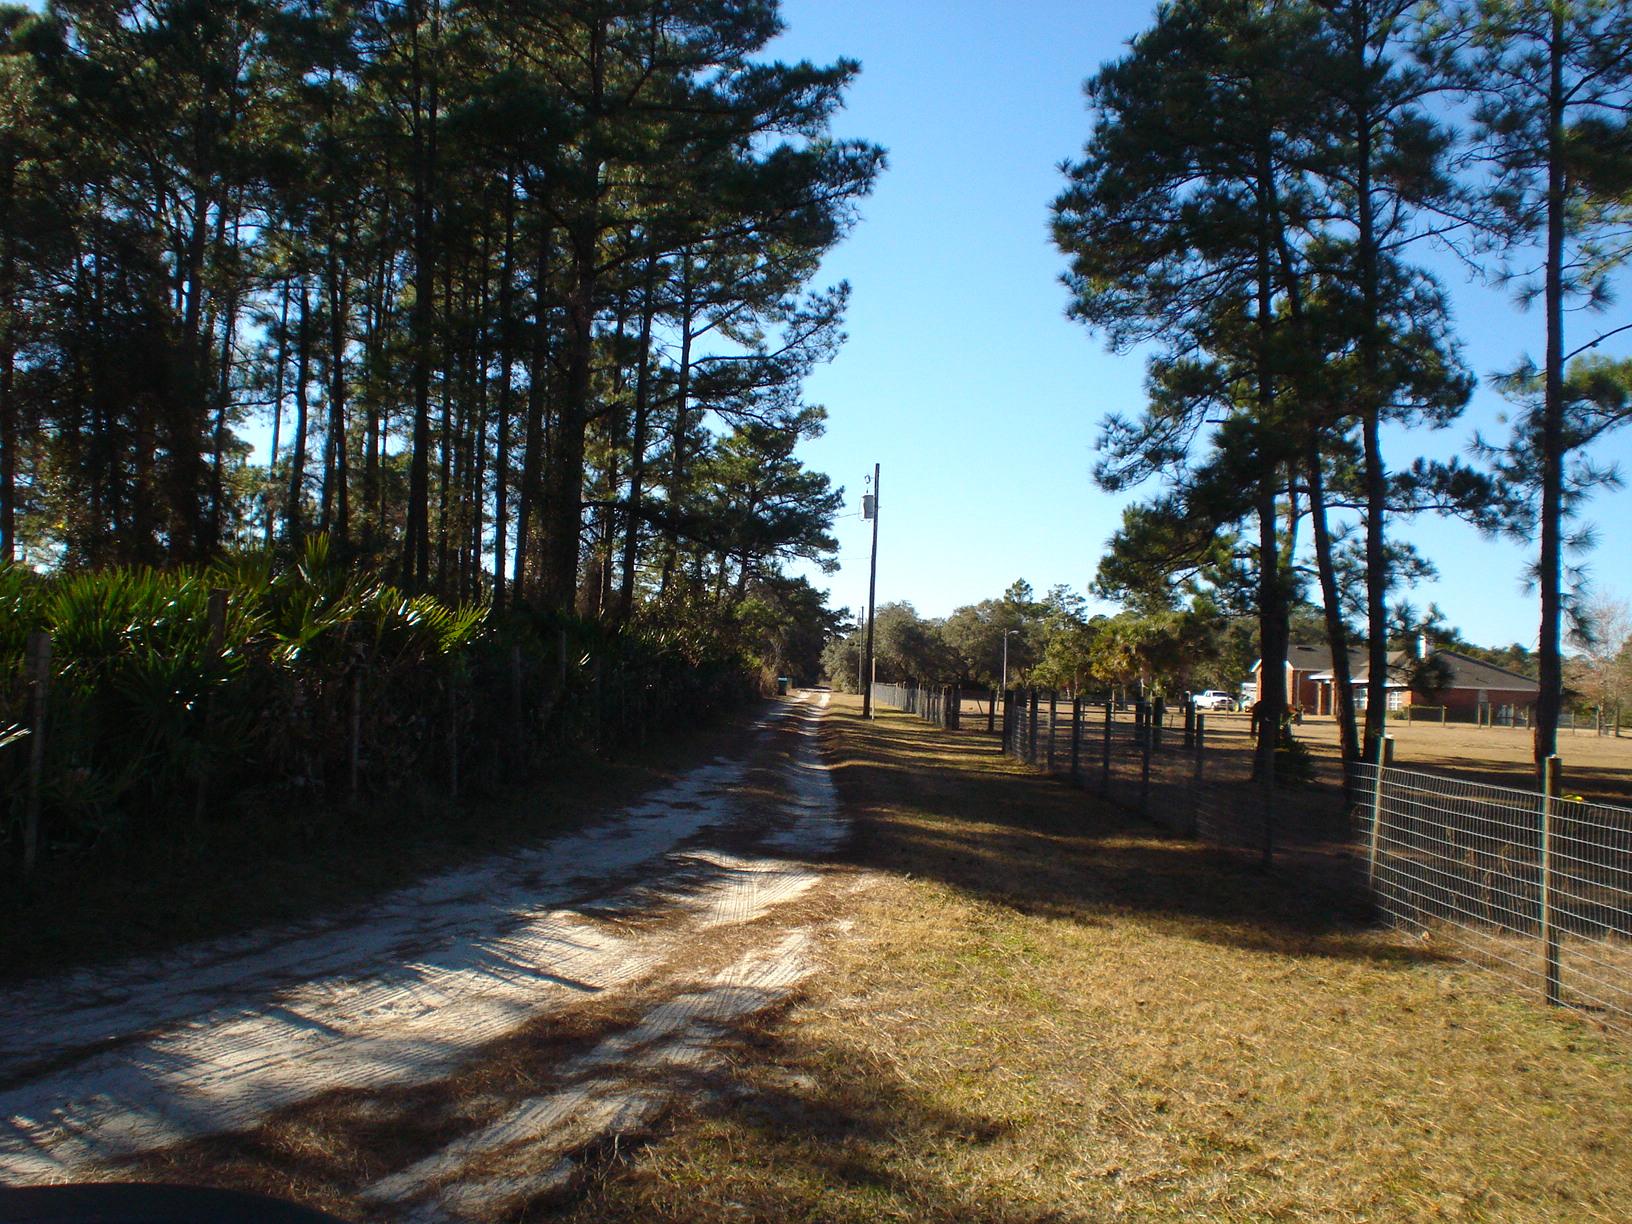 6.33 Acres for sale Deland Florida off Pinelock